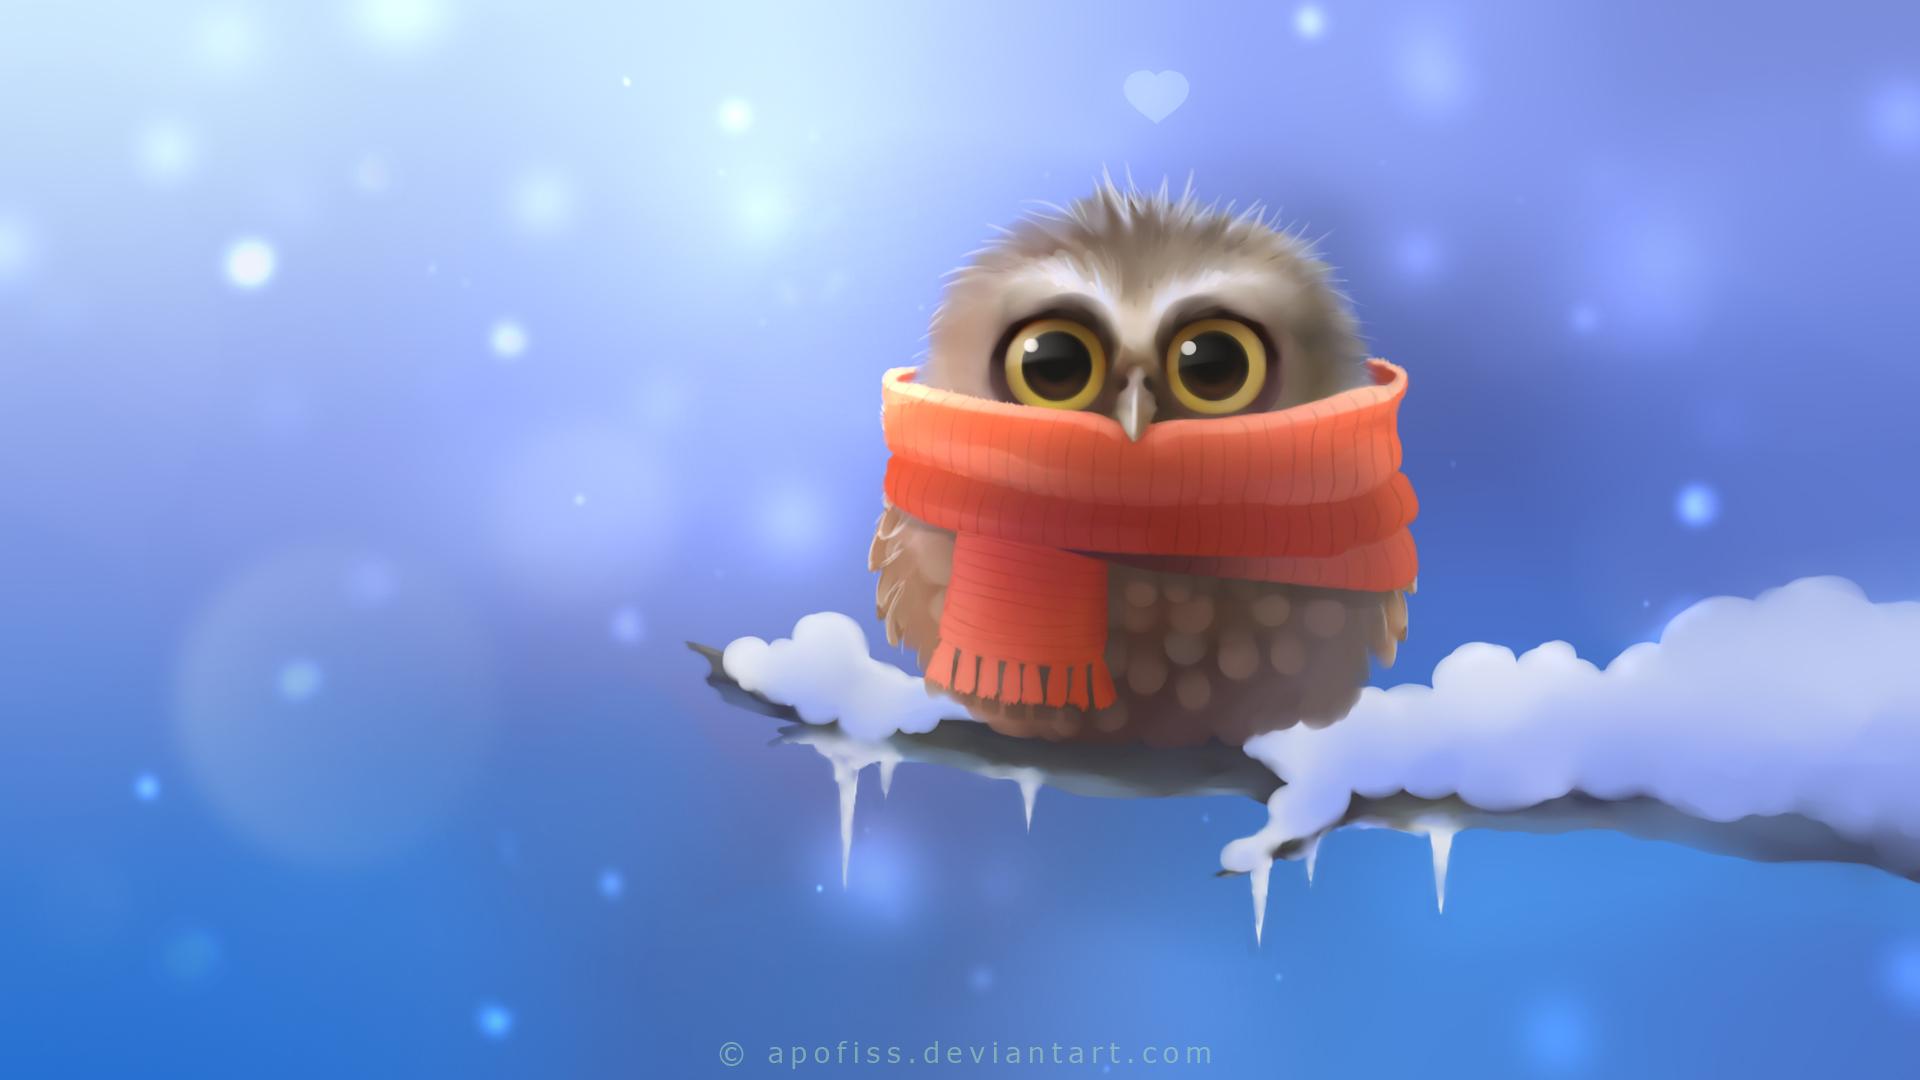 Owl Bird Snow Winter Drawing Scarf cartoon cute eyes pov wallpaper 1920x1080